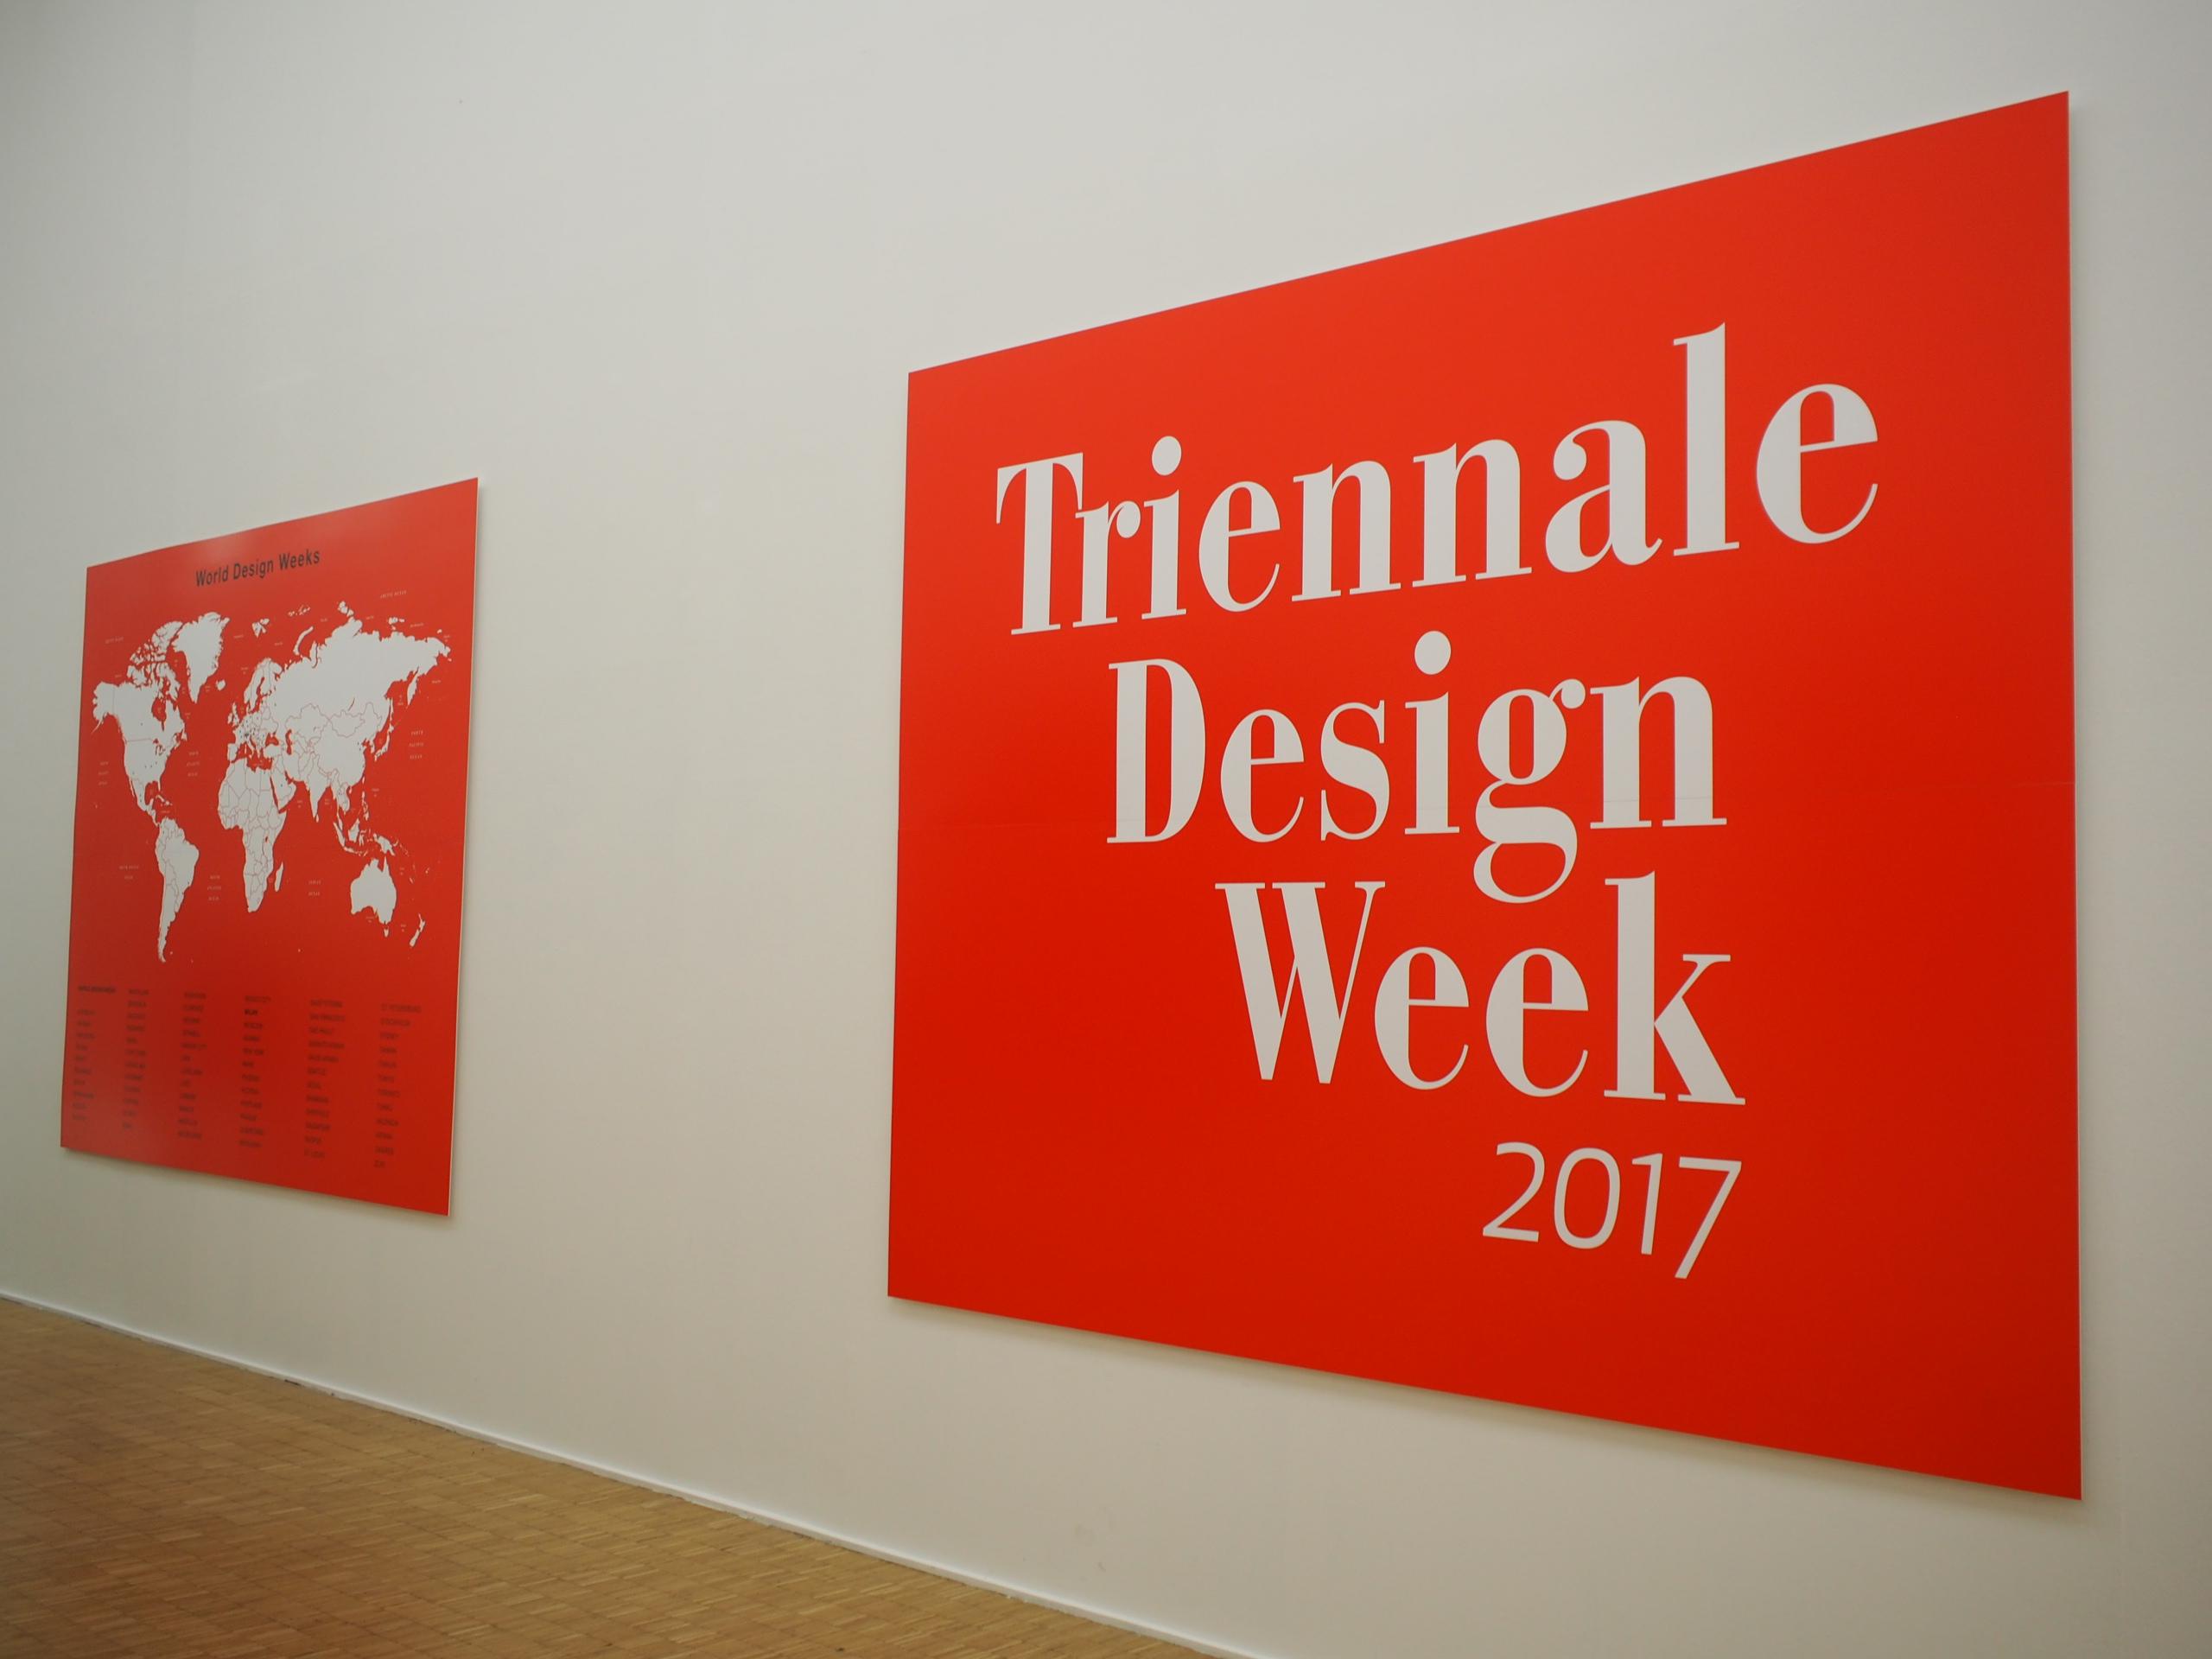 Triennale Design Week